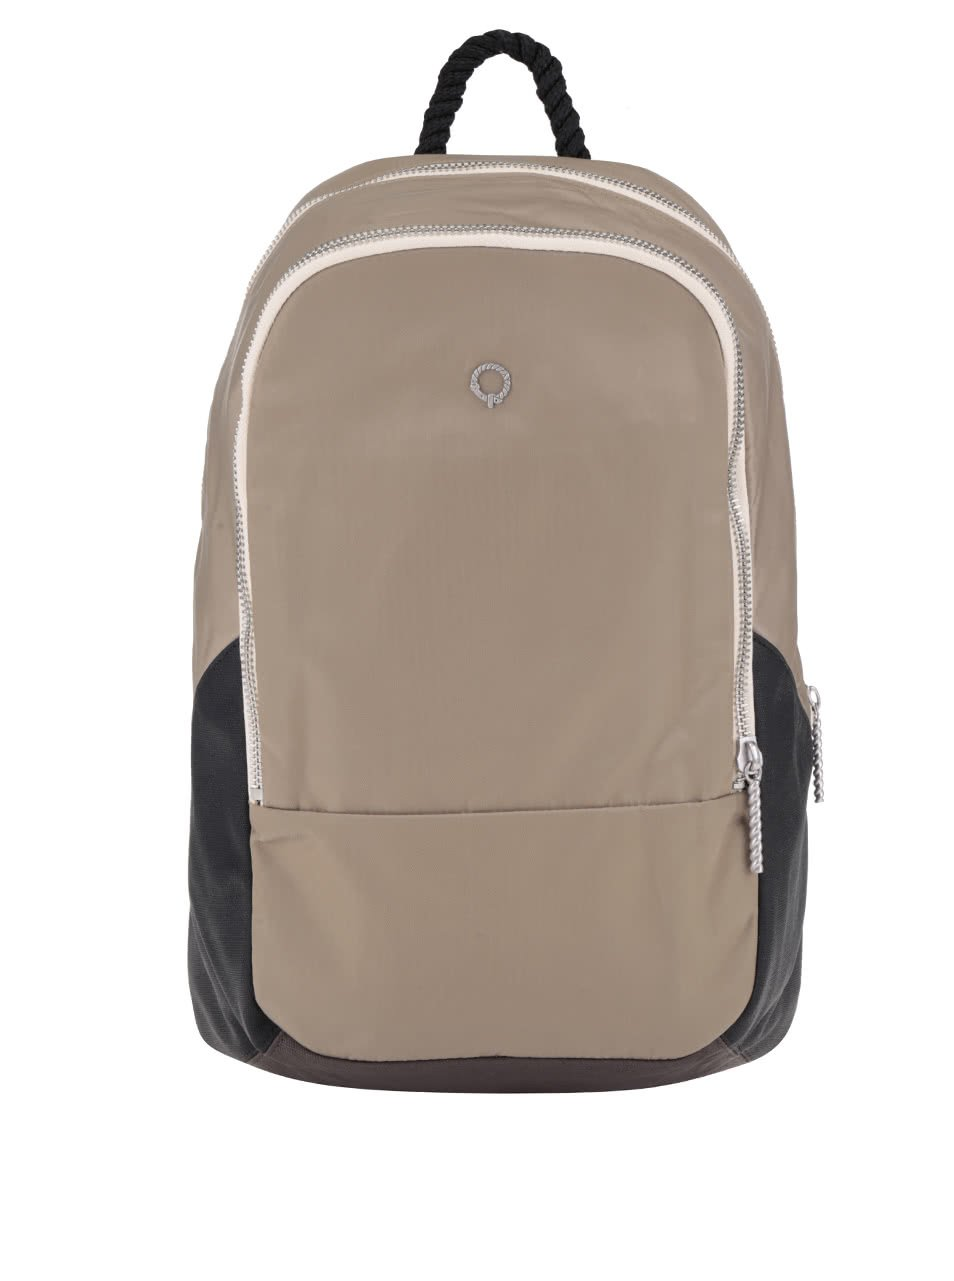 Béžový batoh na zip Stighlorgan Dara